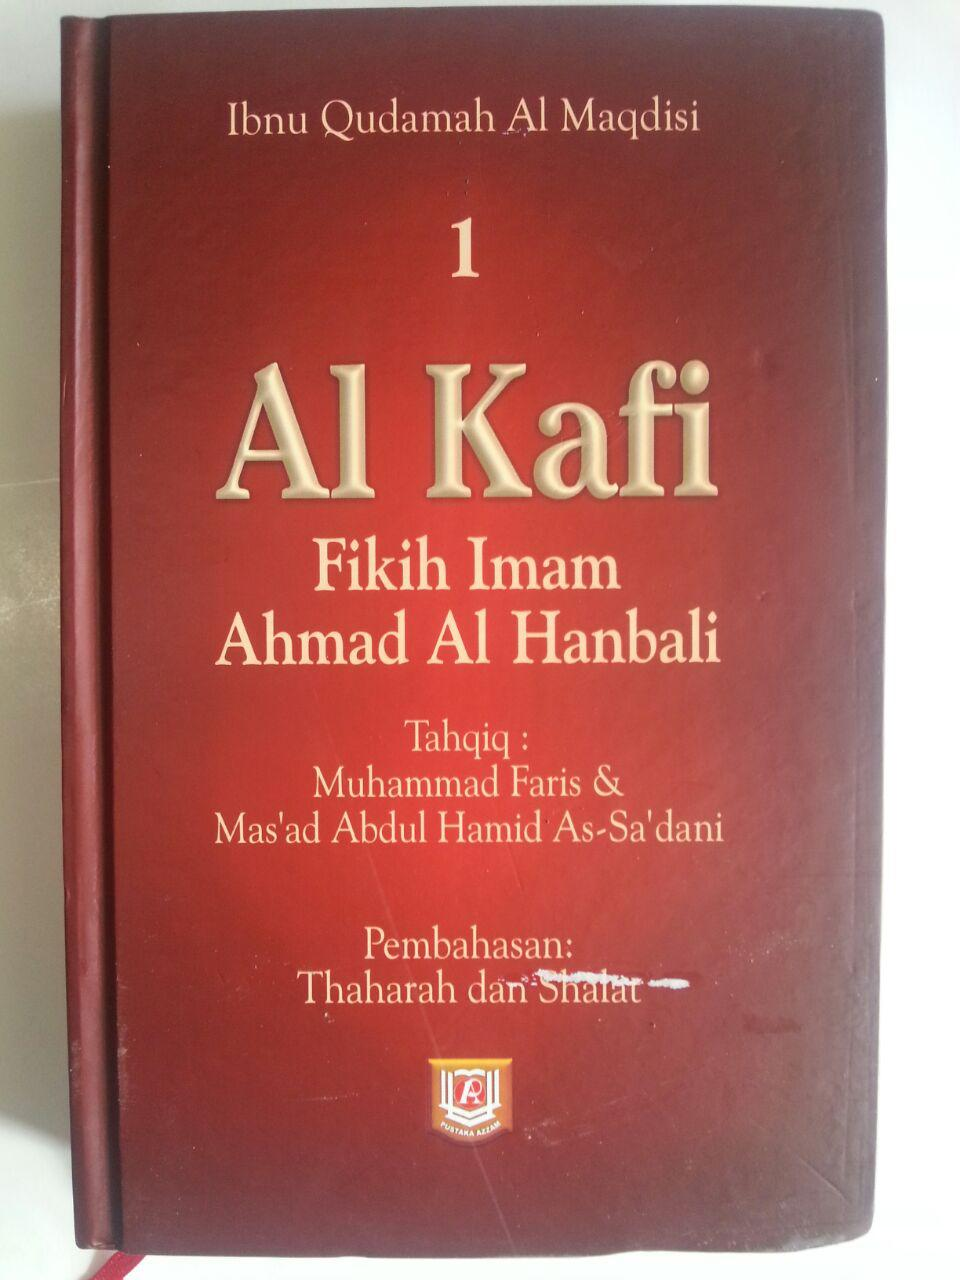 Buku Al Kafi Fikih Imam Ahmad Al Hanbali Jilid 1 cover 2